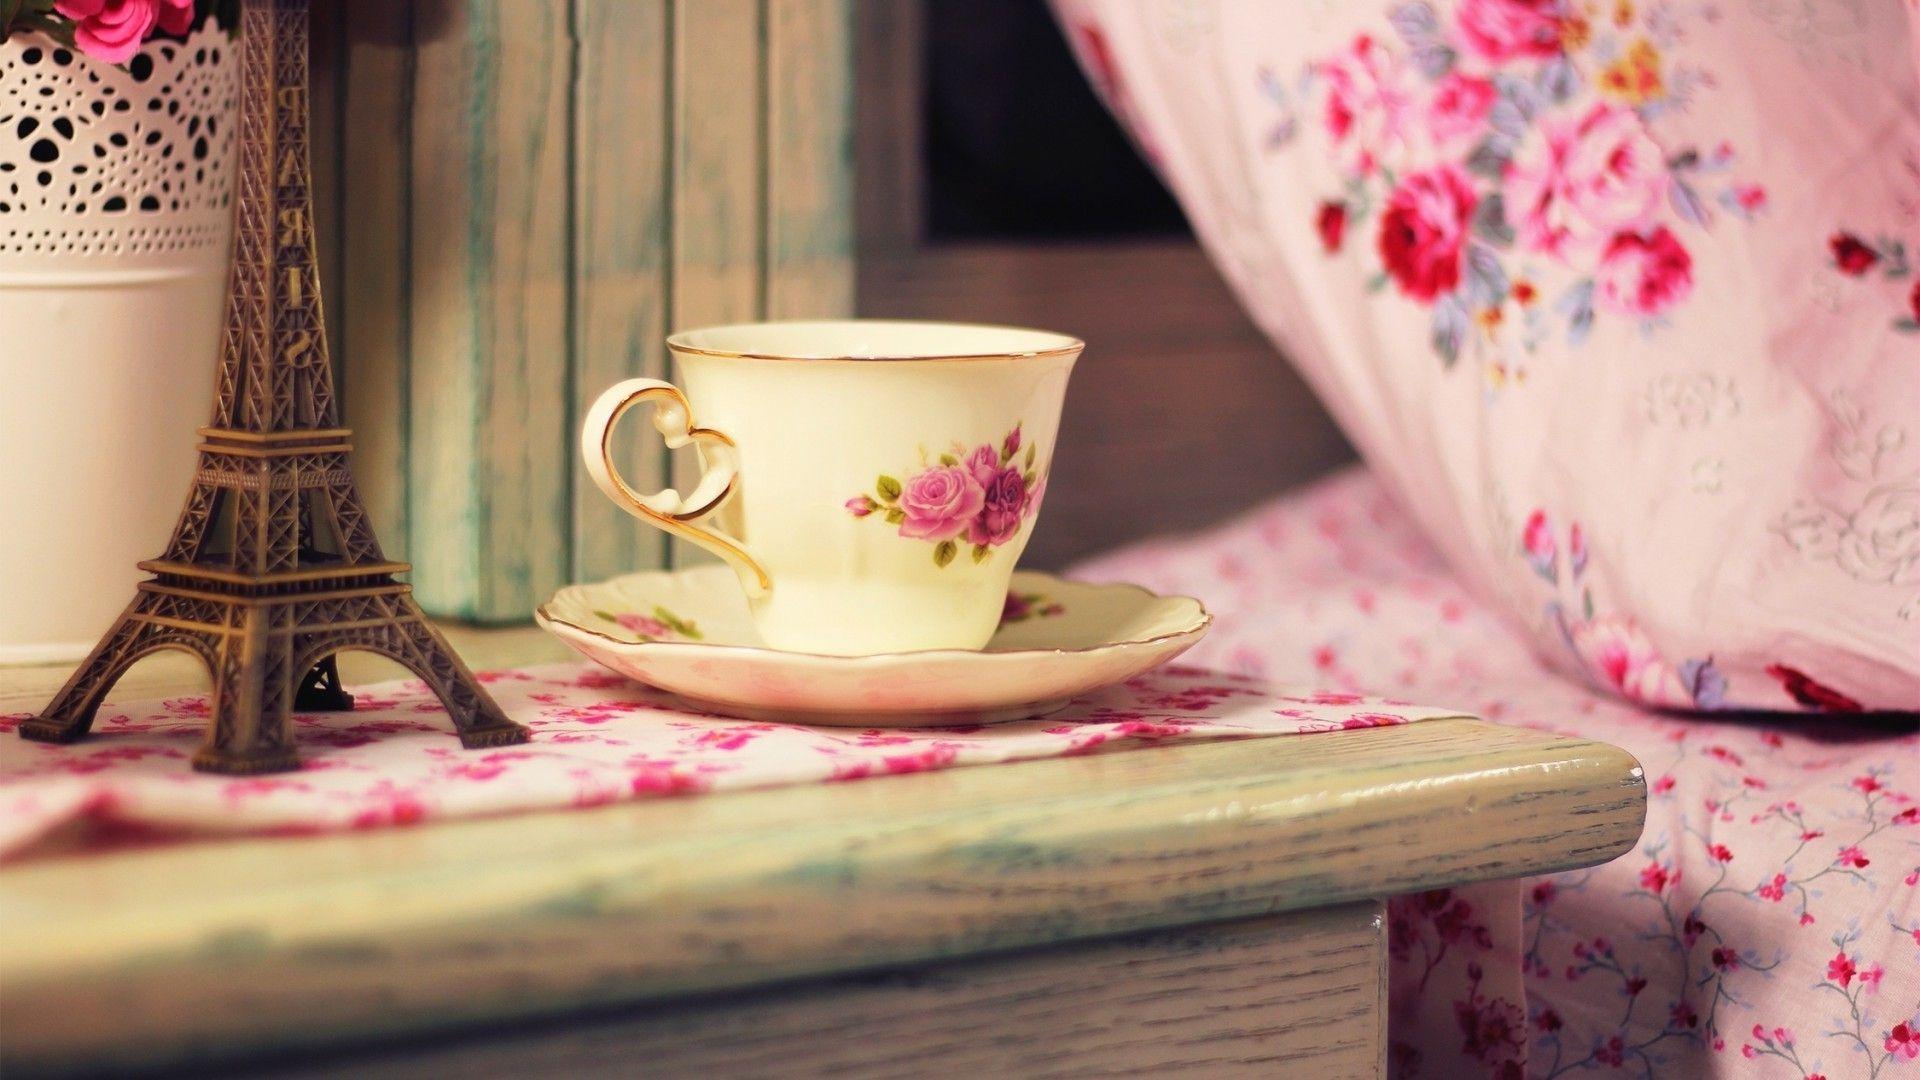 Tea Cup Wallpapers 1920—1080 Teacup Wallpapers 37 Wallpapers